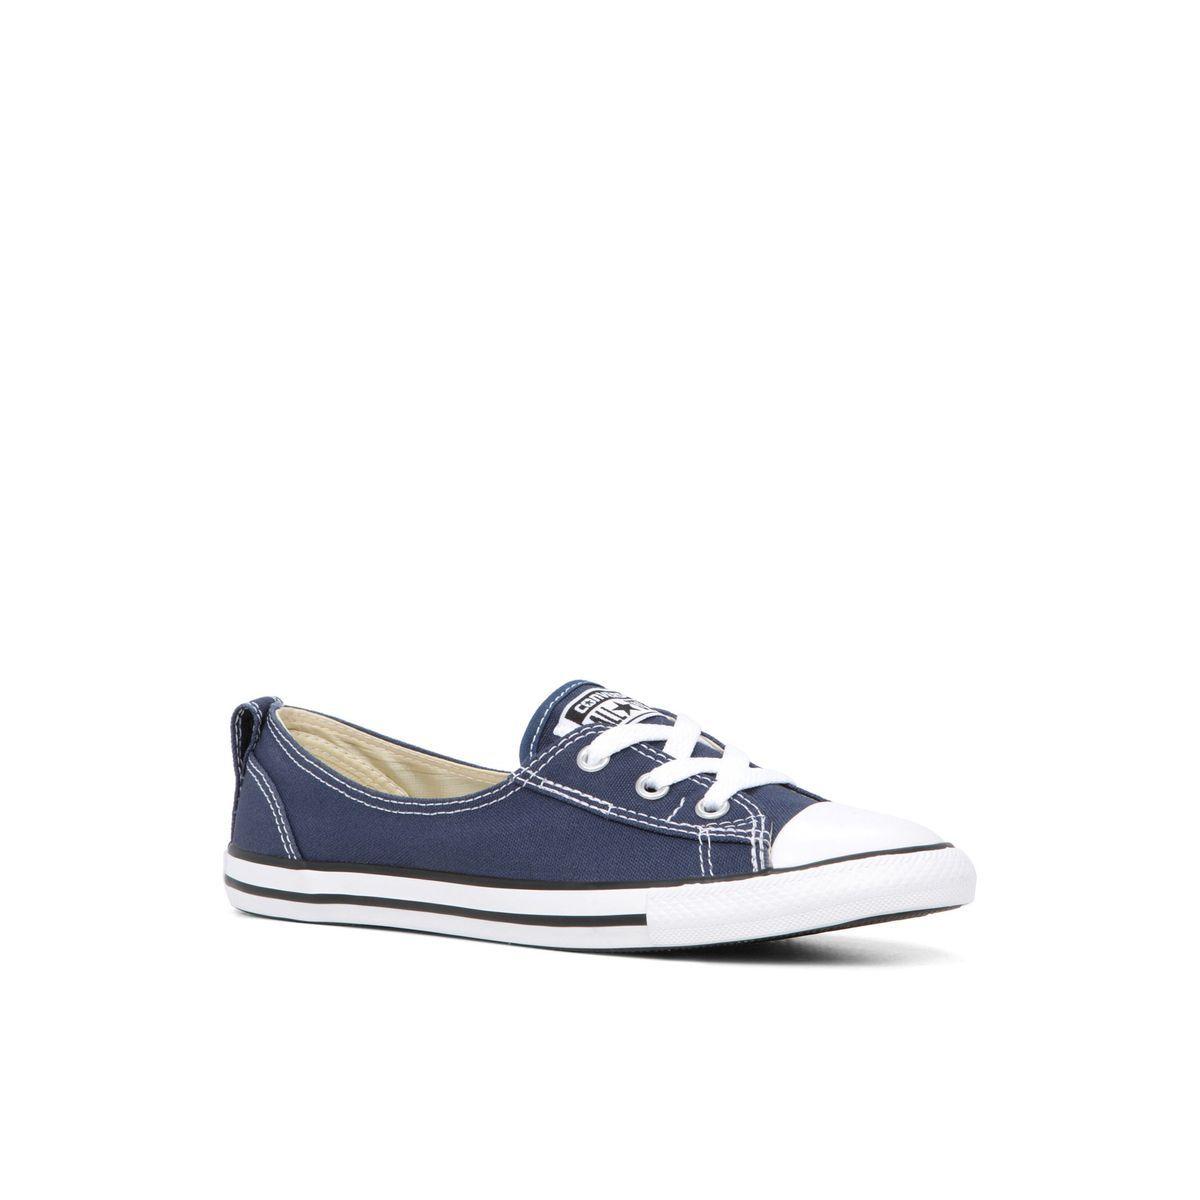 Nydiliven - Converse chez Globo | Vans sneaker, Sneakers, Converse